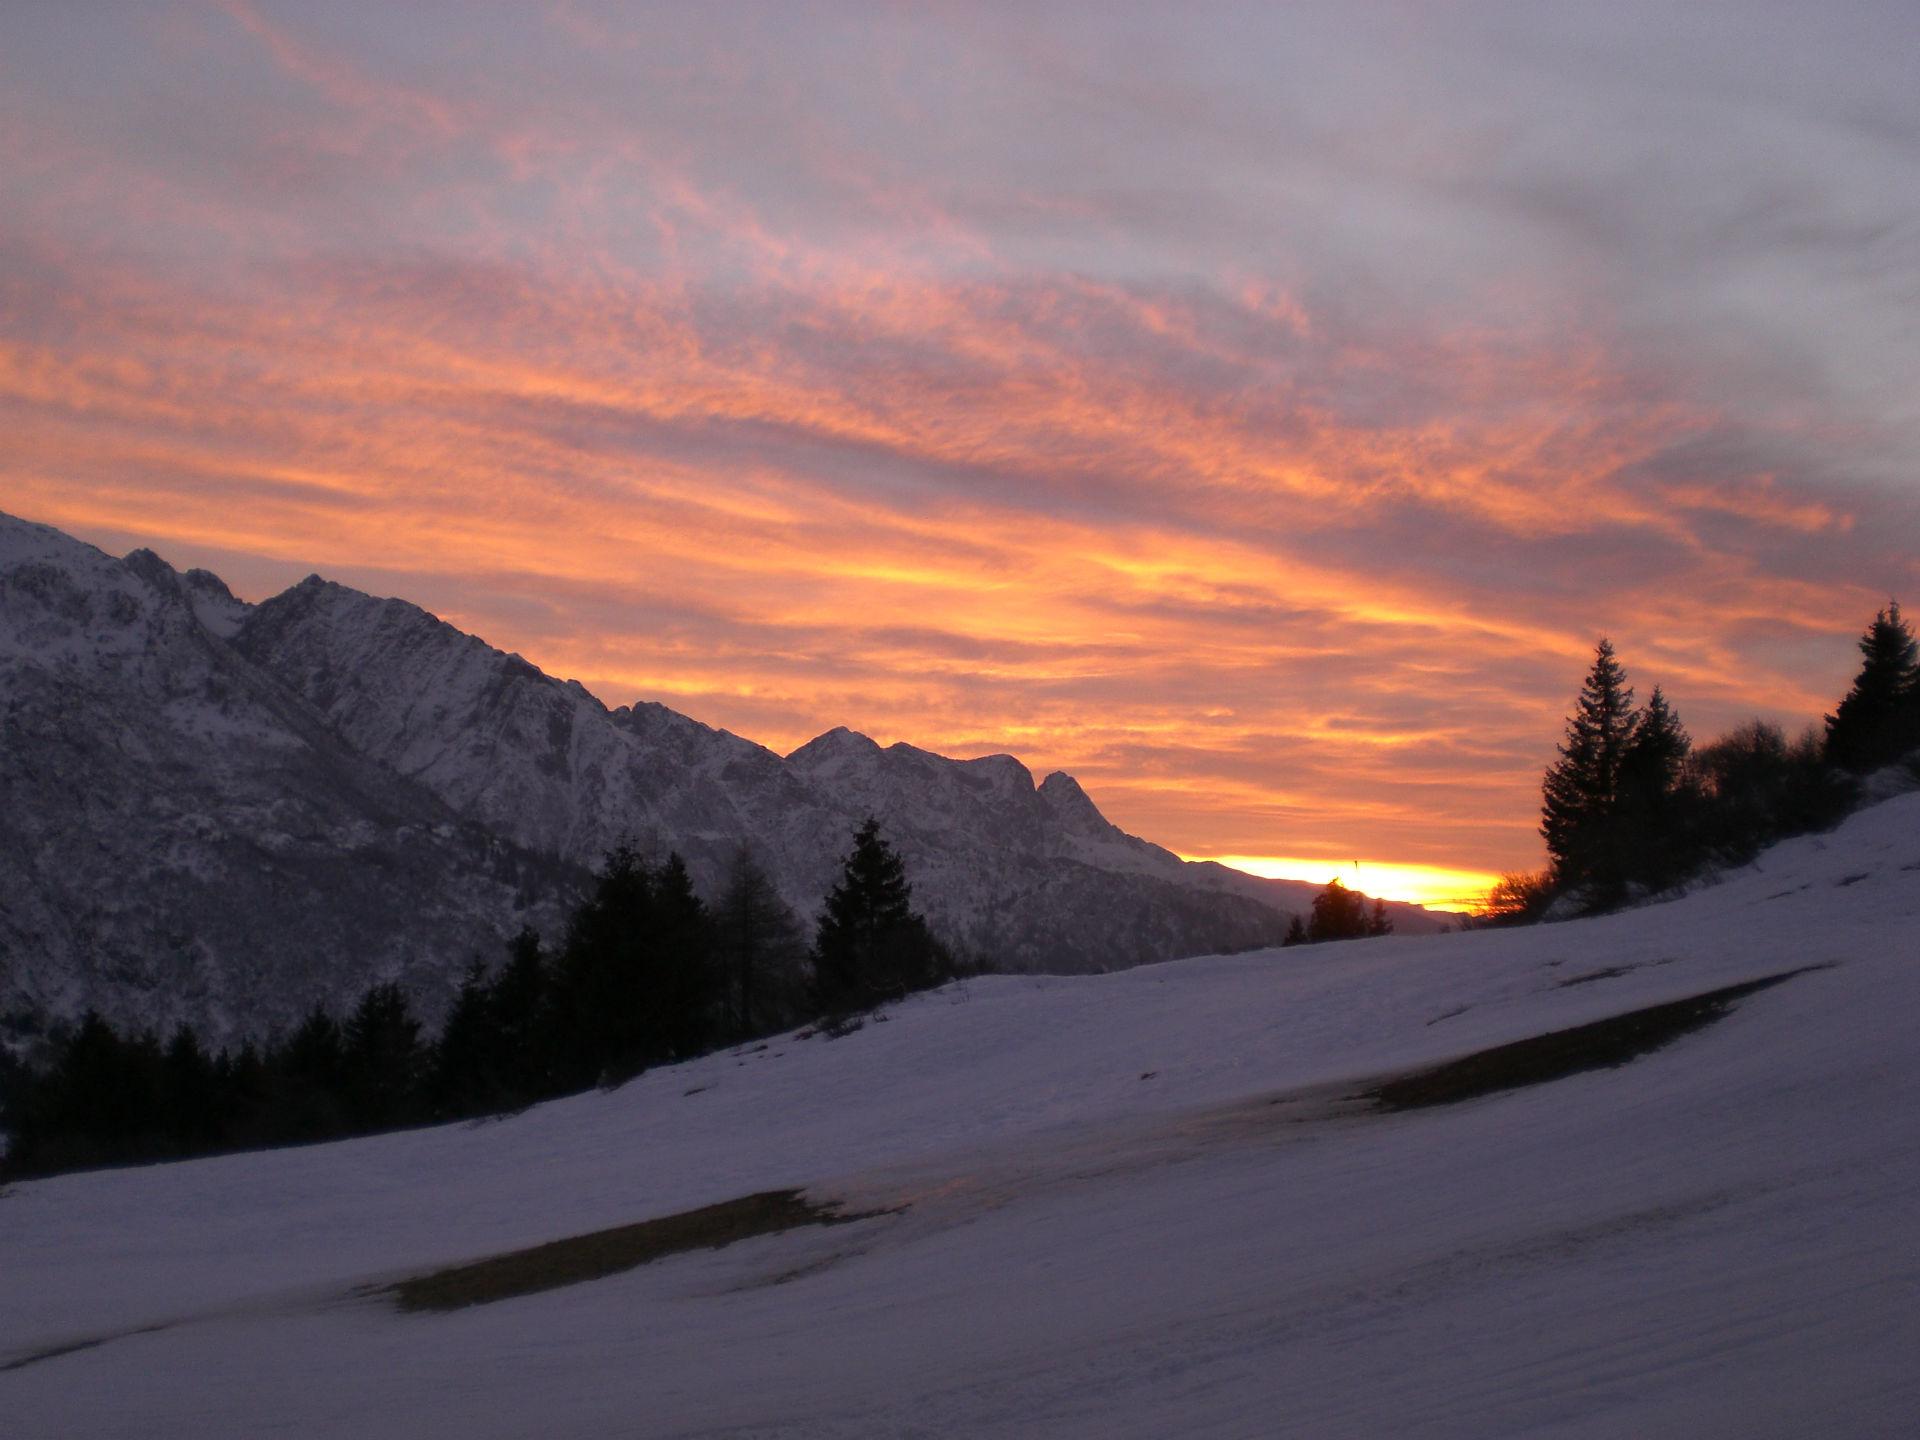 tramonto bellissimo in montagna dal Tonale